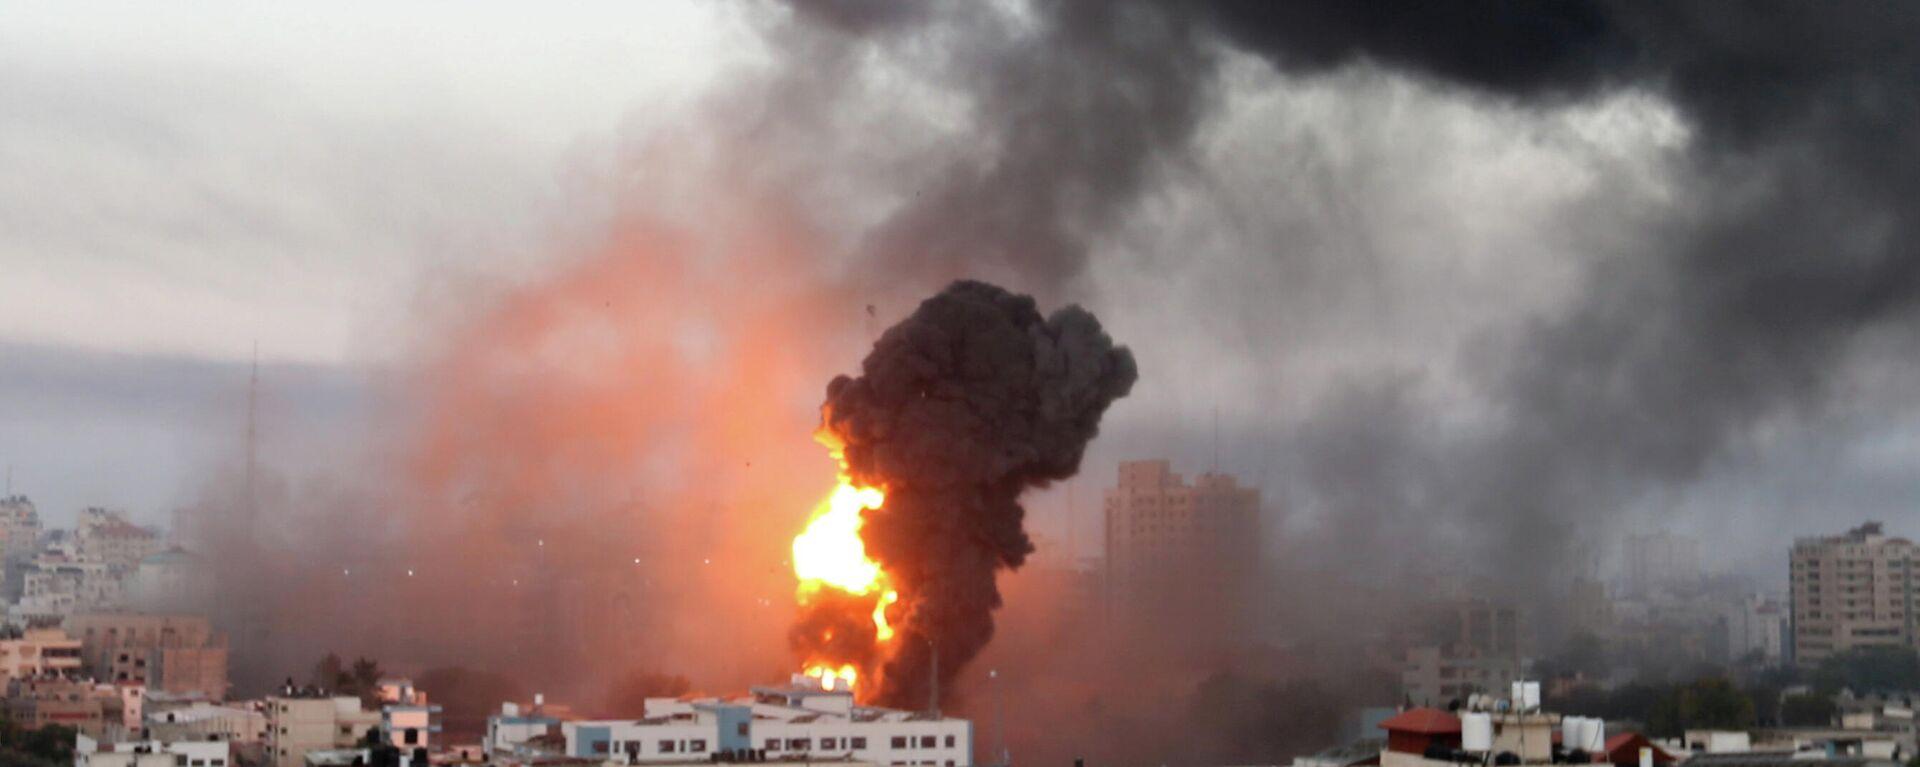 Israelische Raketenangriffe auf Gaza, 12. Mai 2021 - SNA, 1920, 13.05.2021